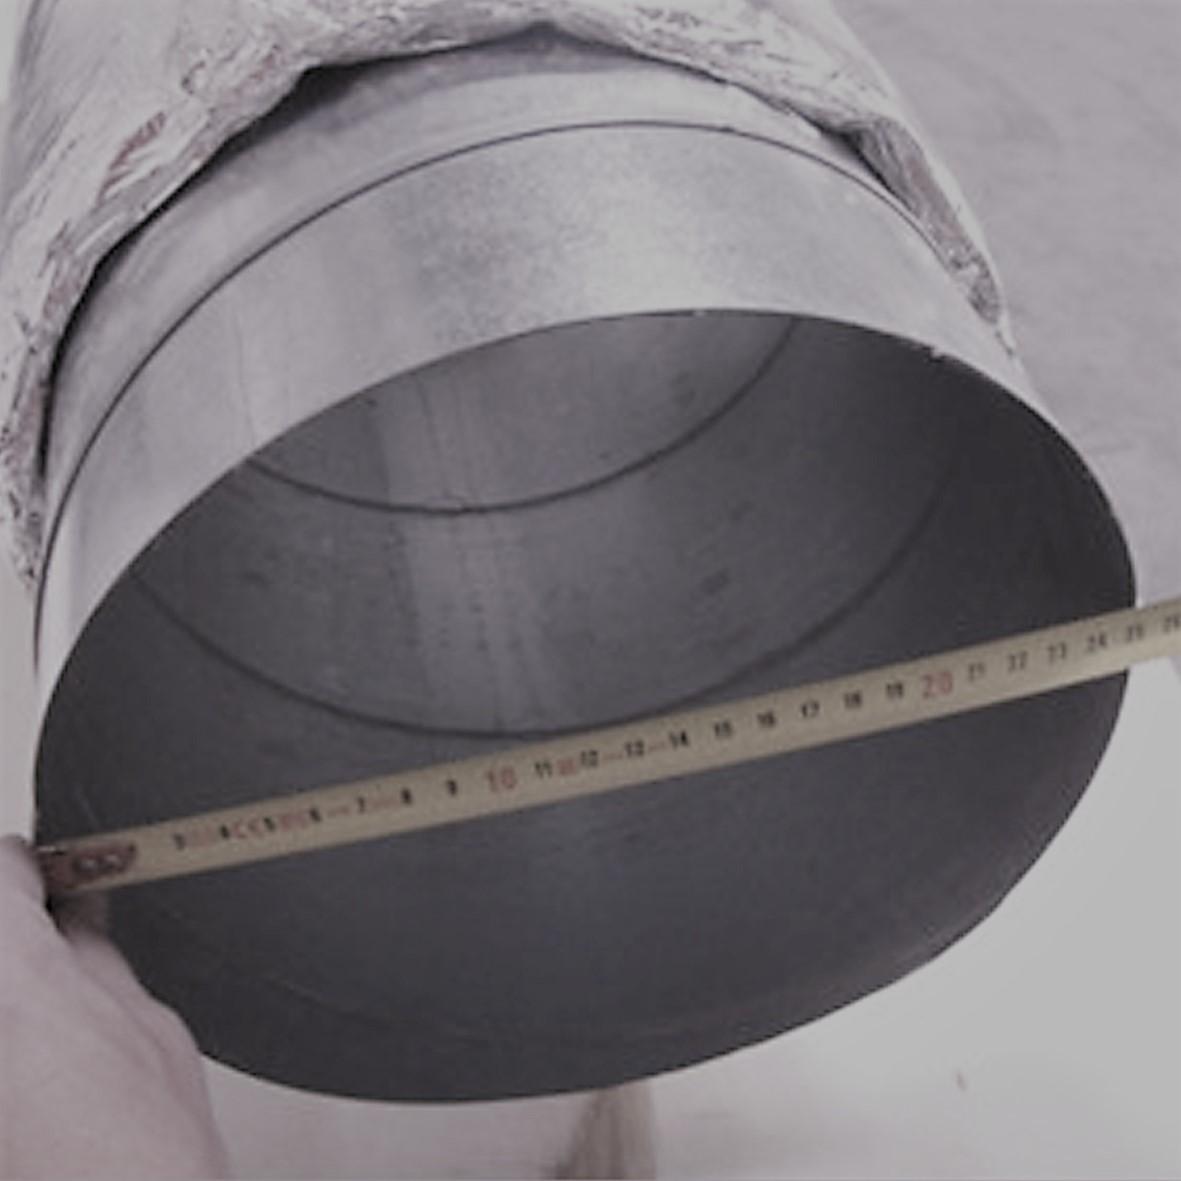 materassino cover 120 b-n (11)